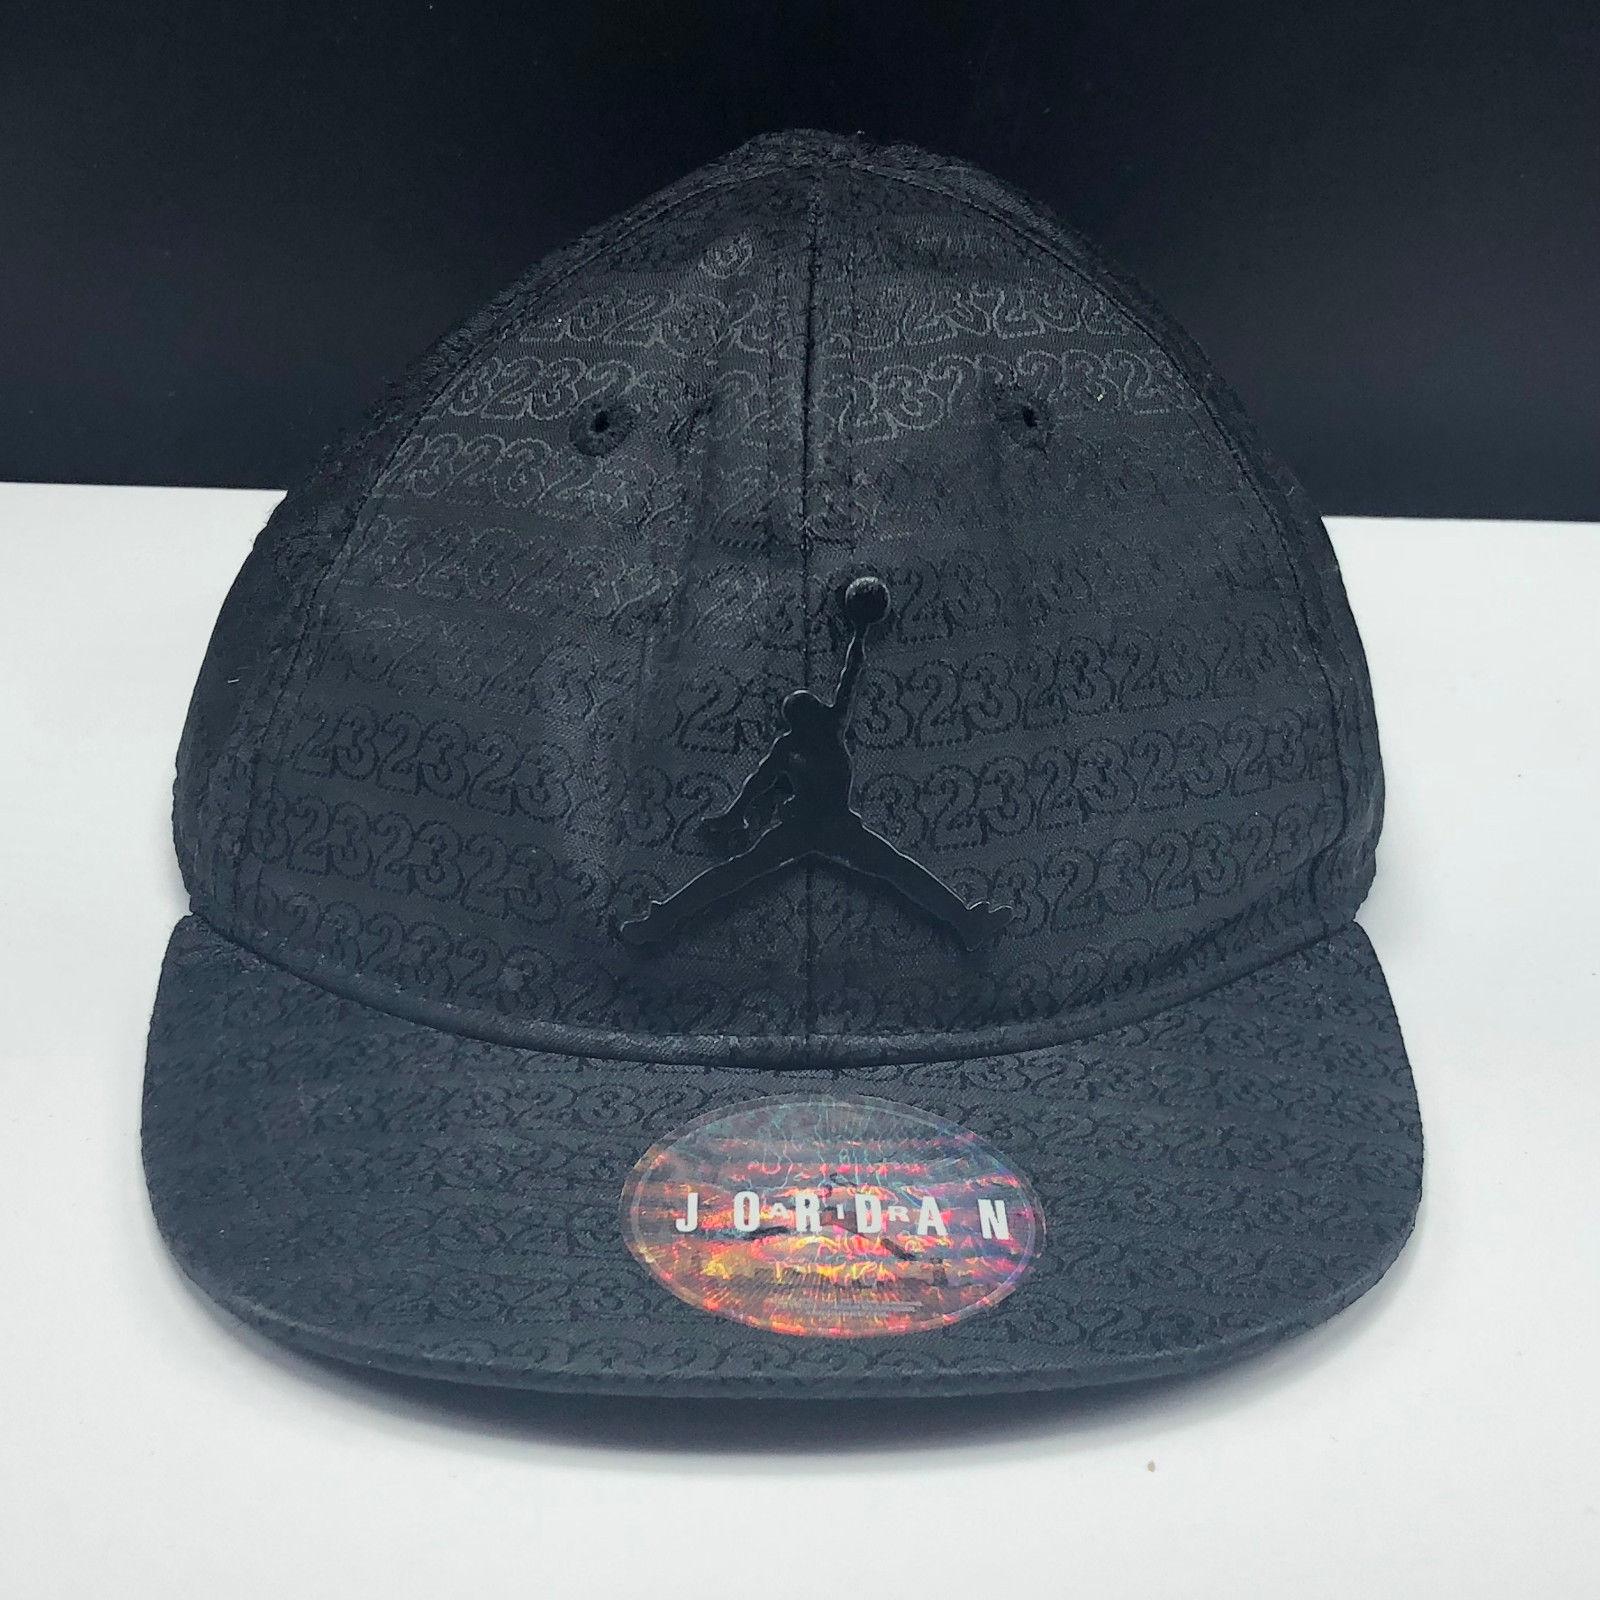 d2ad35242 Michael Air Jordan toddler hat cap 23 nba and similar items